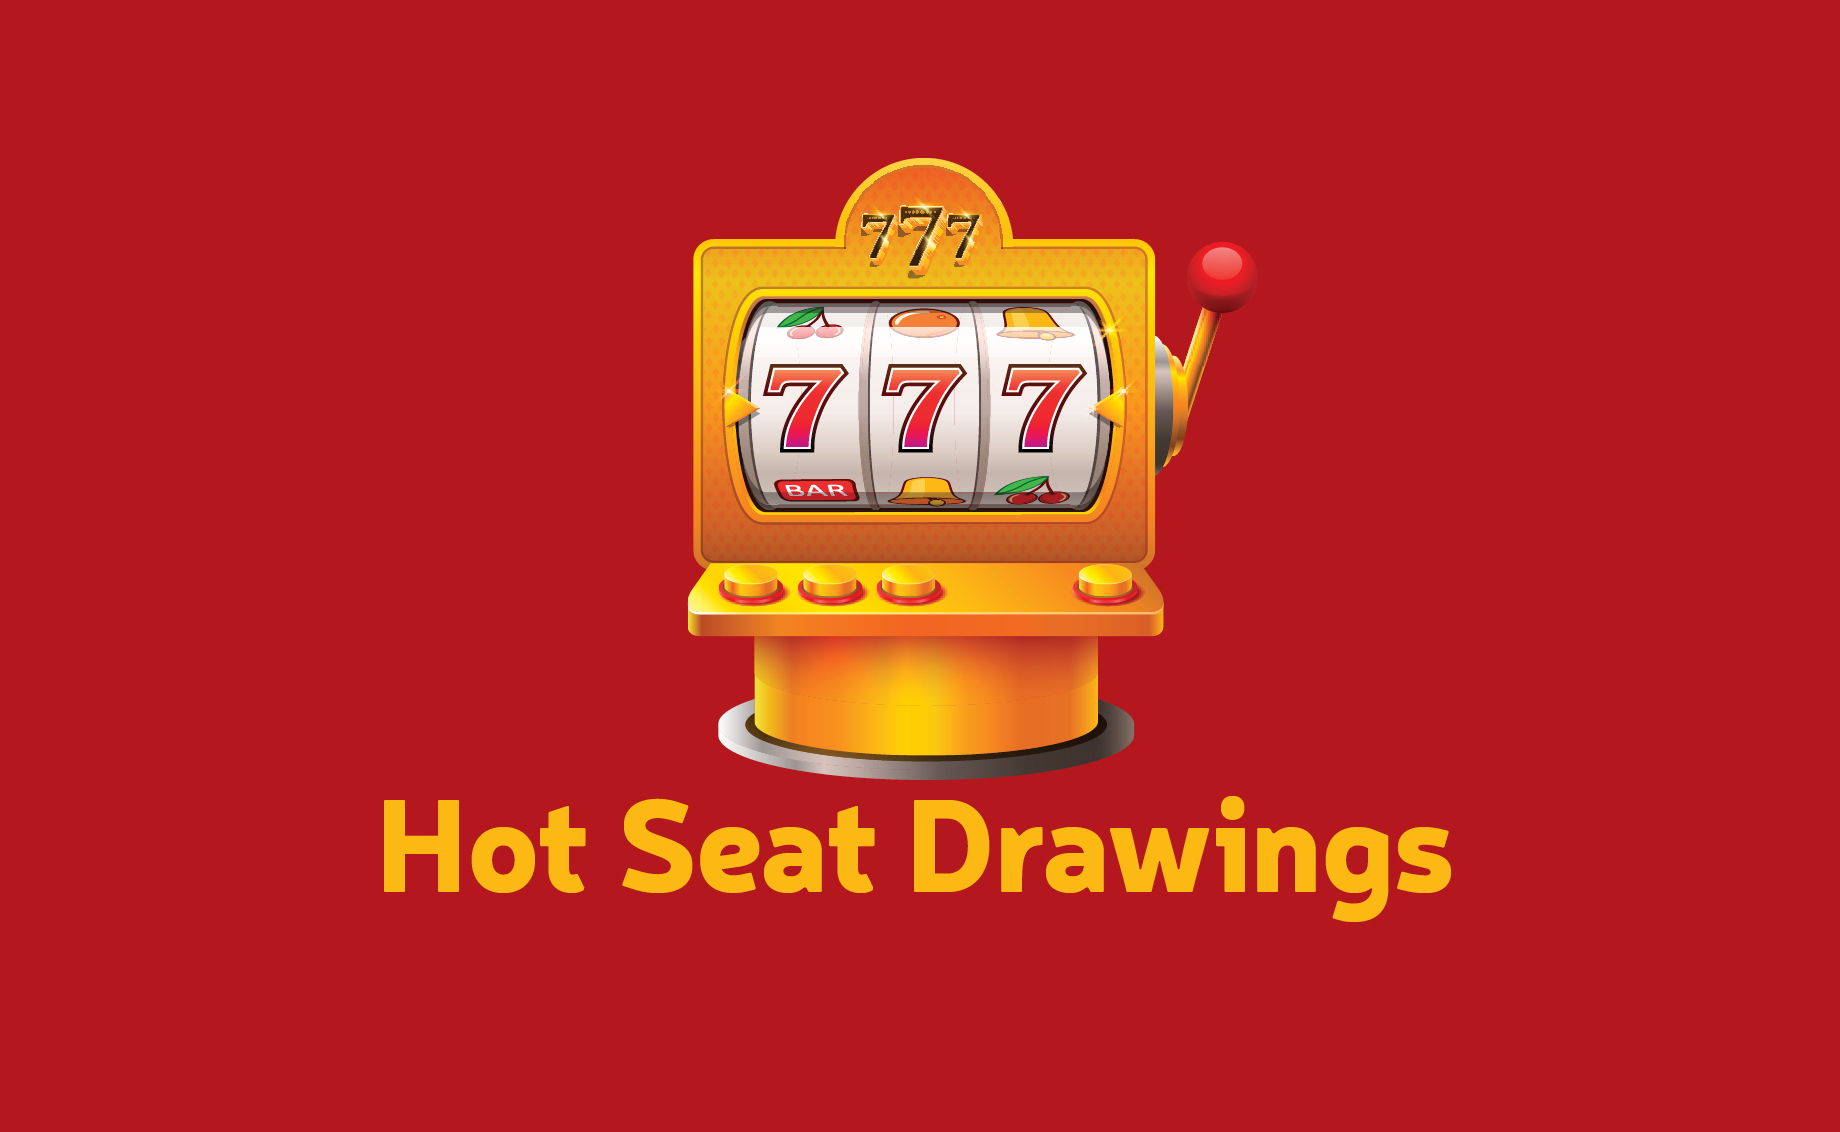 February Hot Seat Drawings